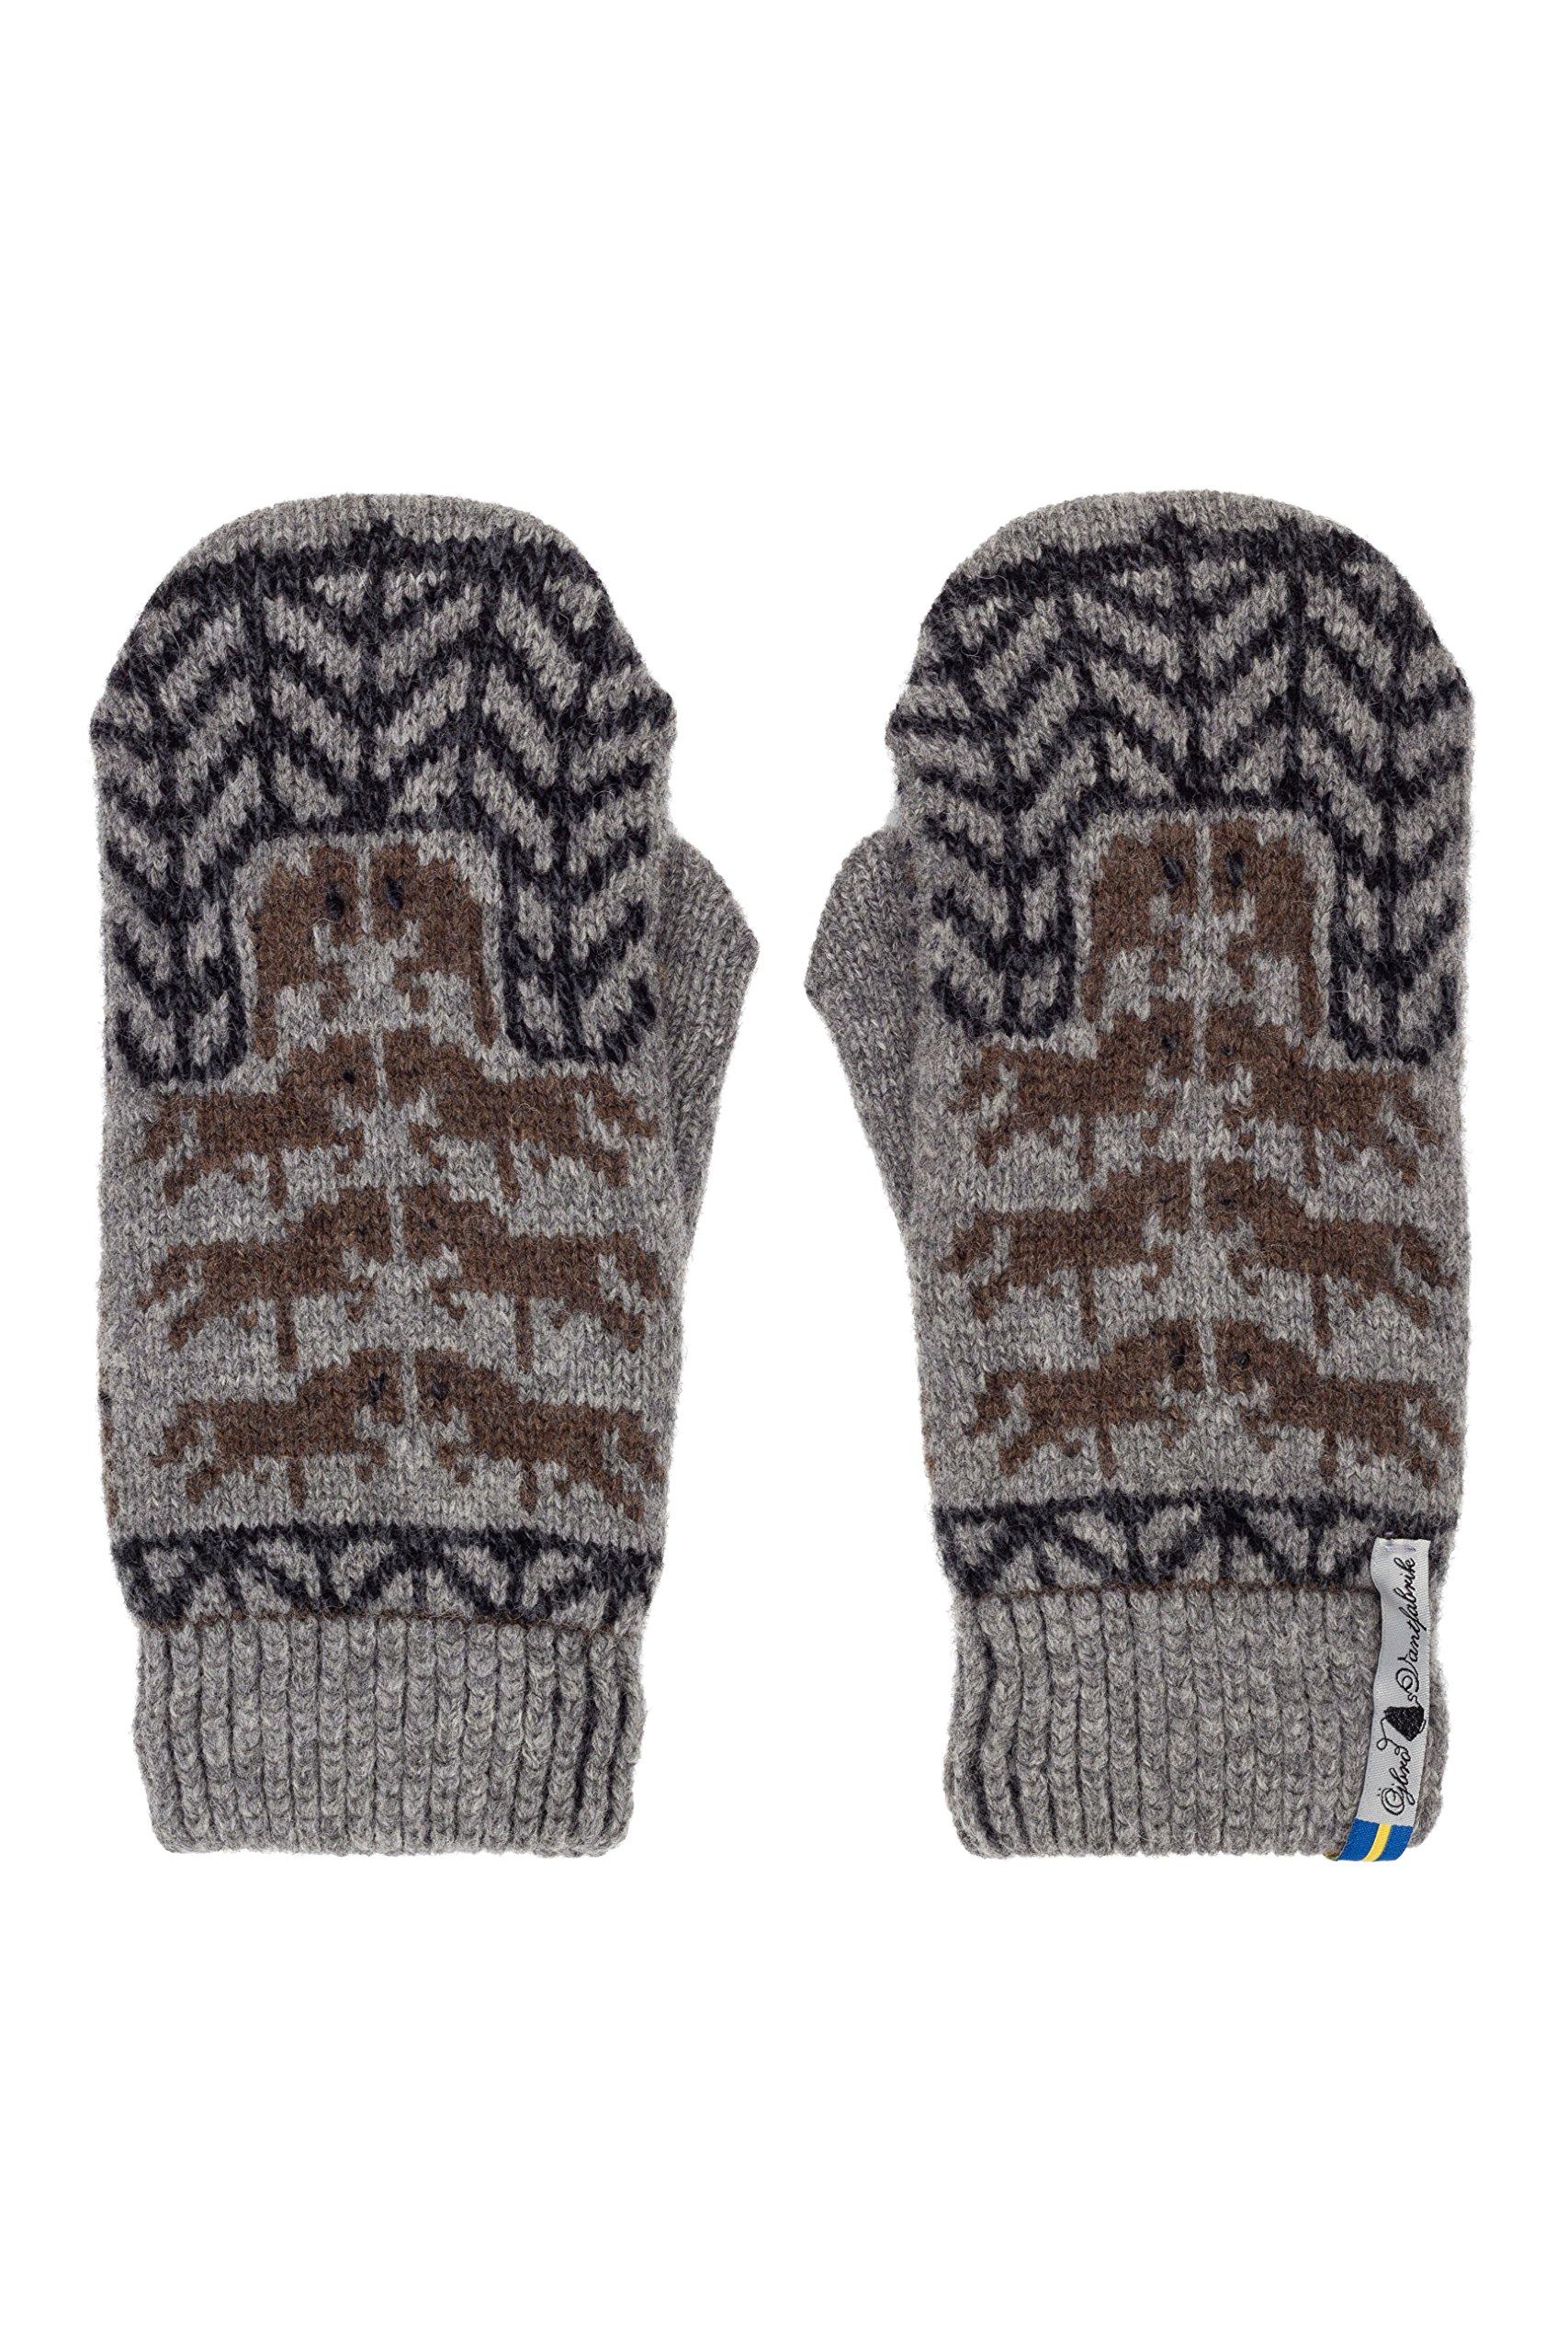 Öjbro Swedish made 100% Merino Wool Soft Thick & Extremely Warm Mittens (Medium, Gotland Grå)